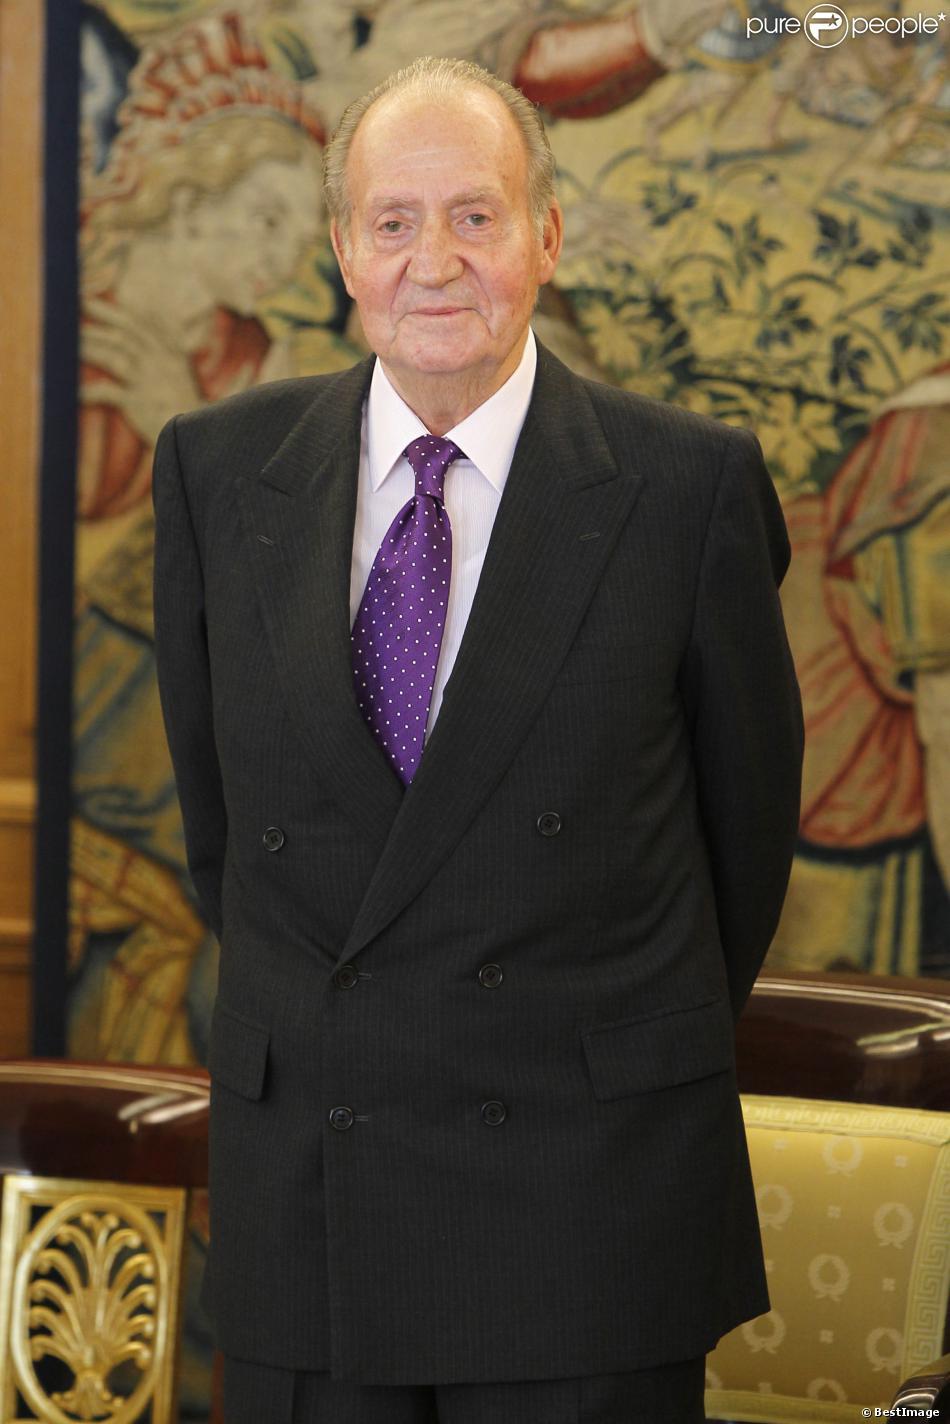 Juan Carlos I Biography - Childhood, Life Achievements ...  |Juan Carlos